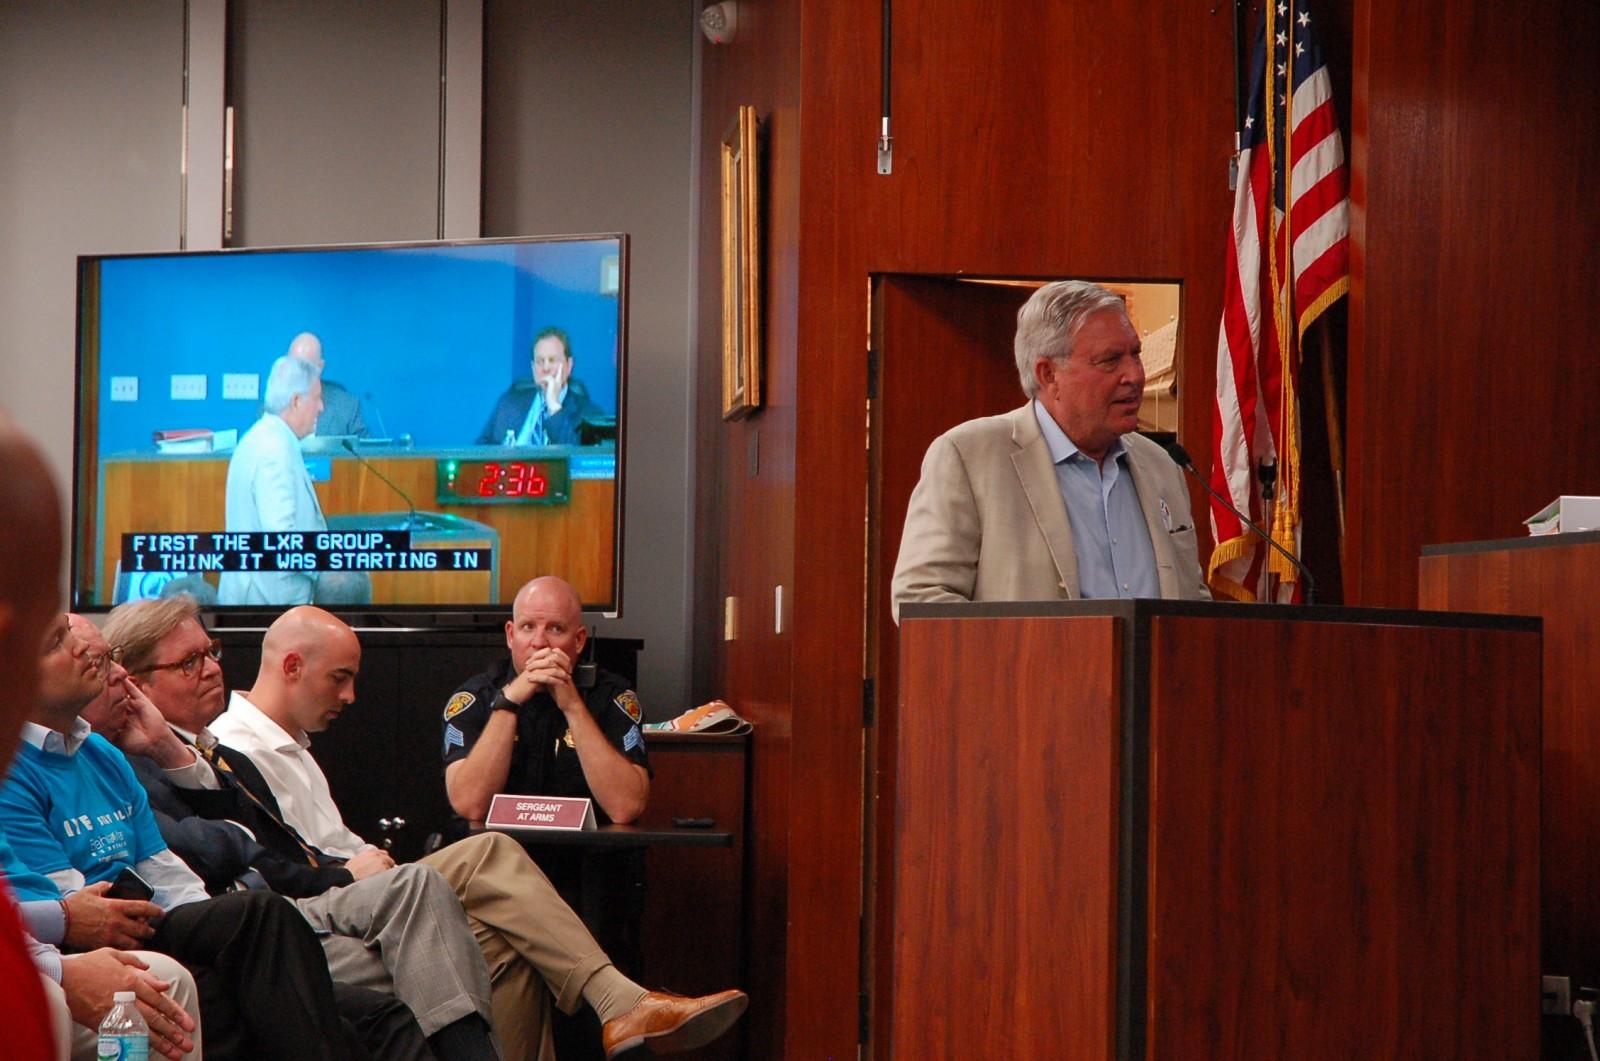 Skip Zimbalist addressess the Fort Lauderdale City Commission meeting last night (June 8).